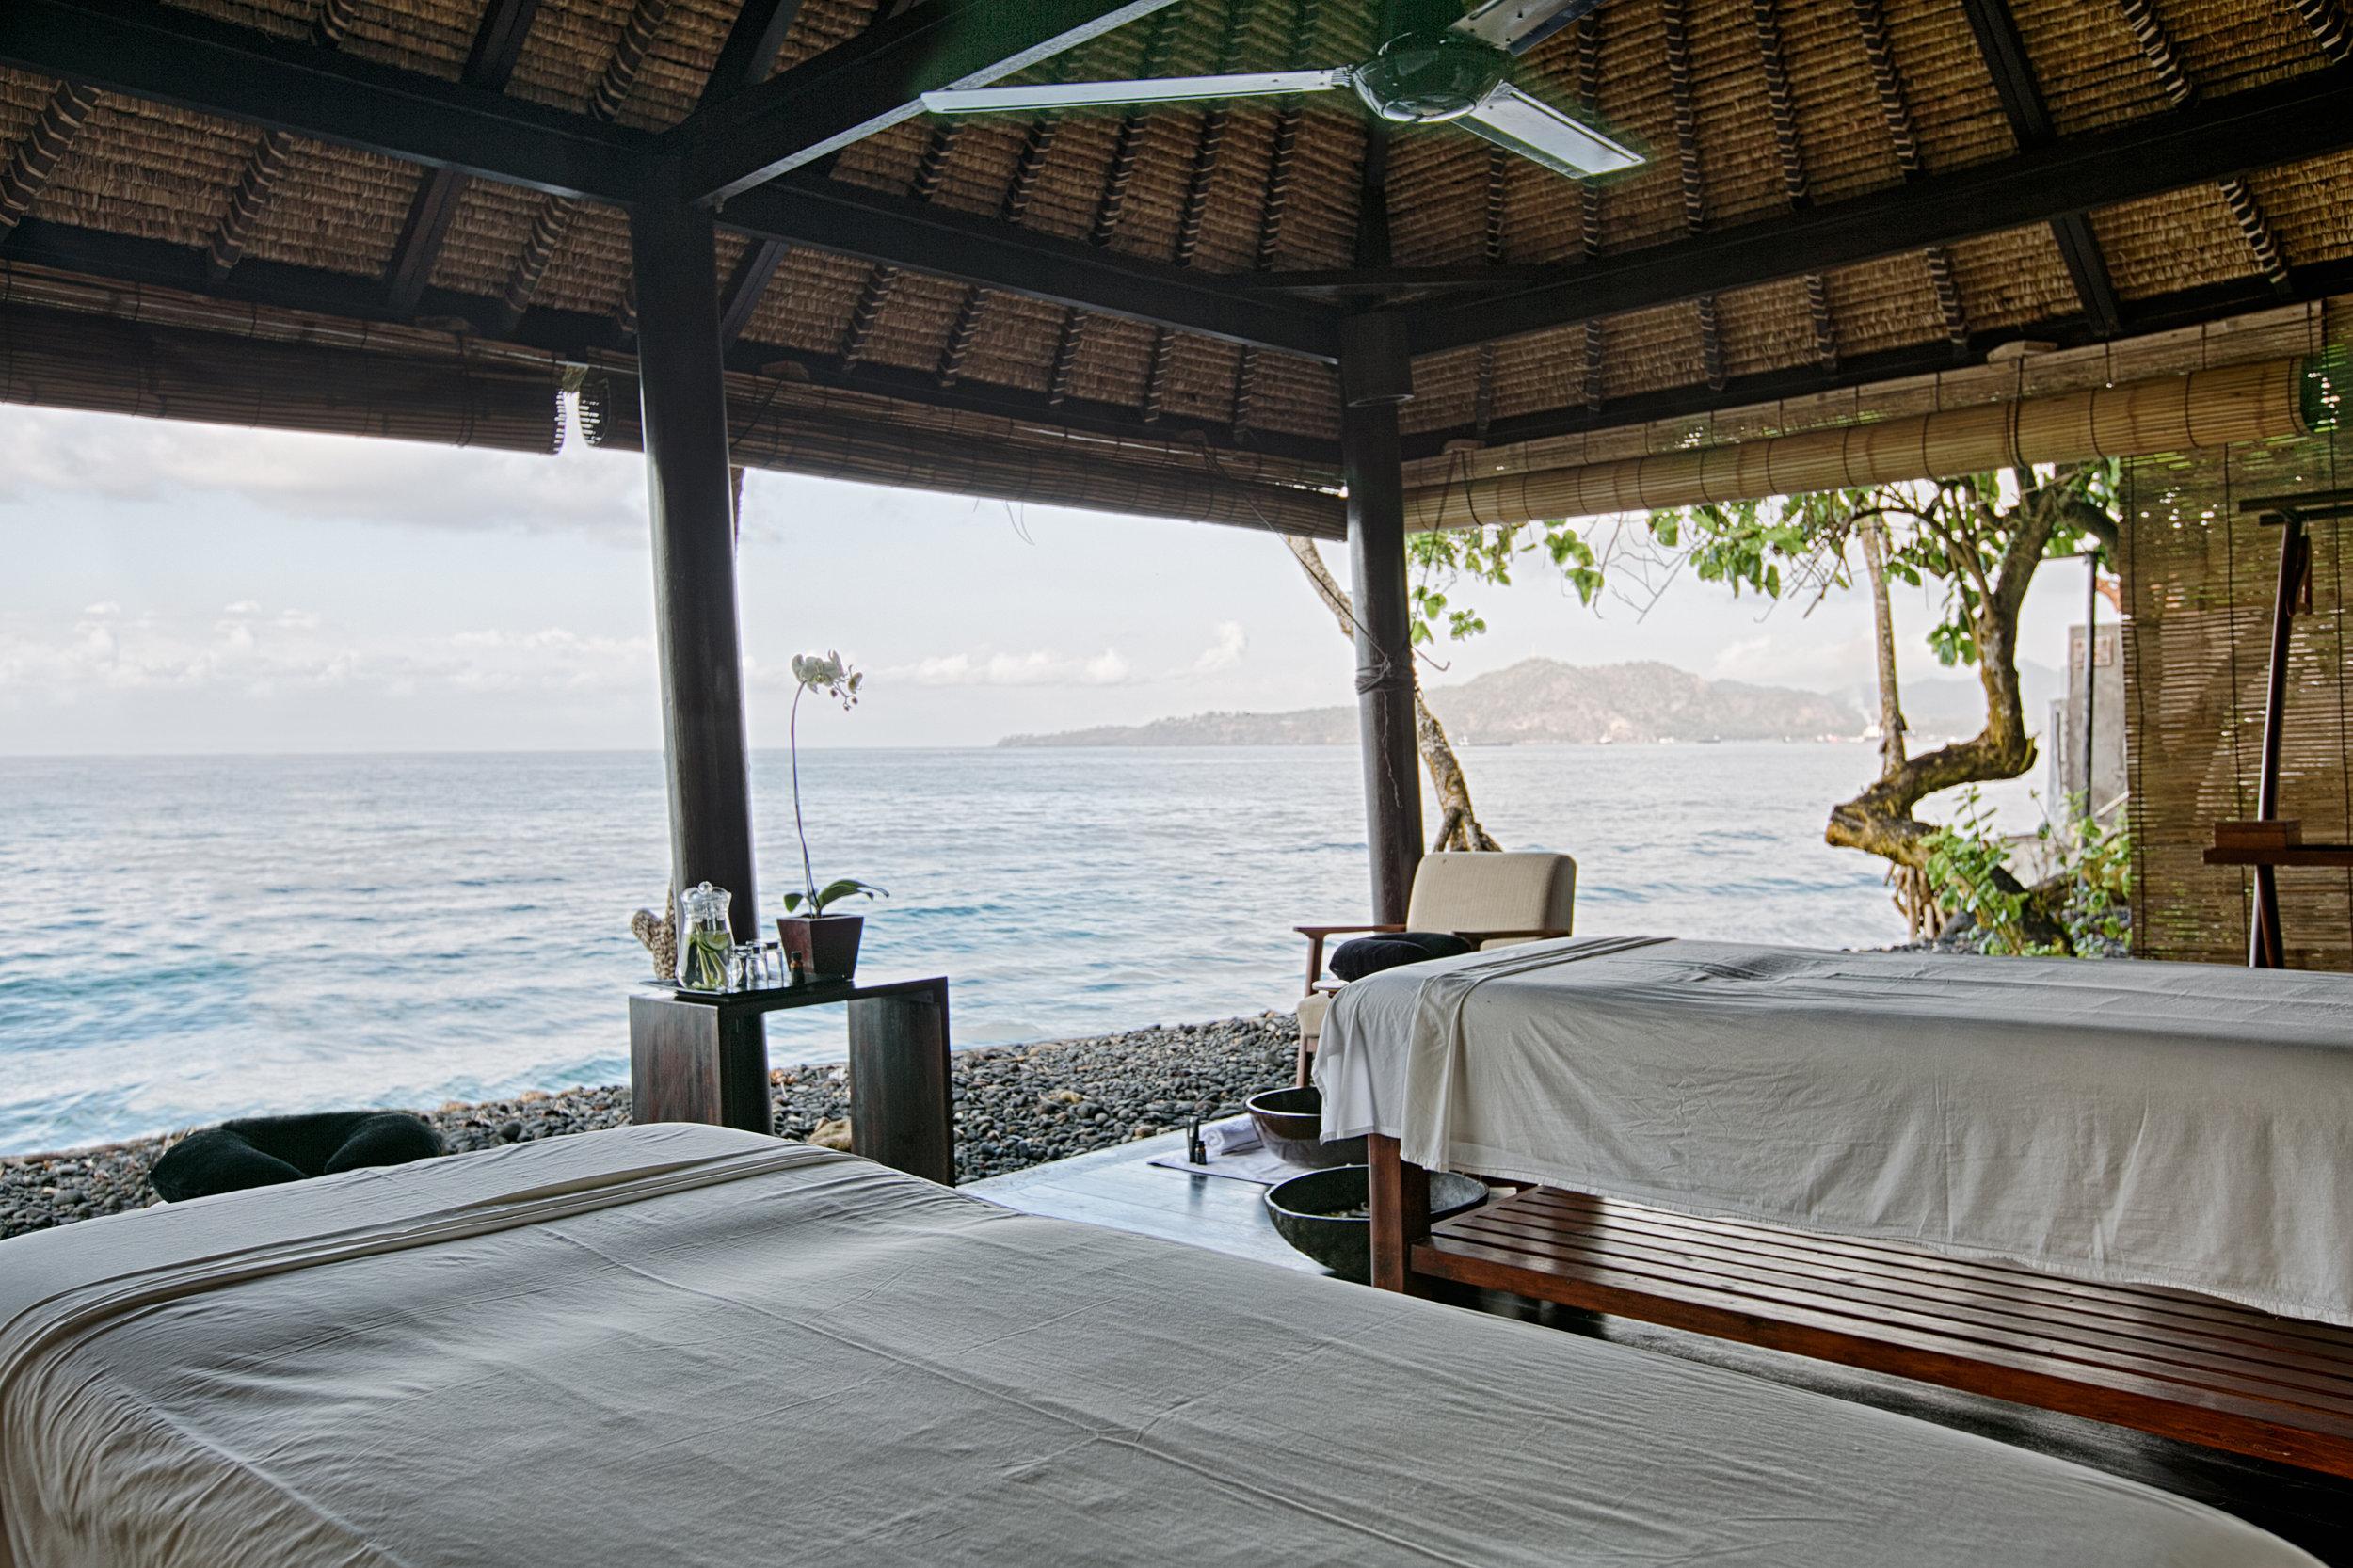 Alila Manggis - Alila Experiences - Balinese Healing Treatment 02.jpg